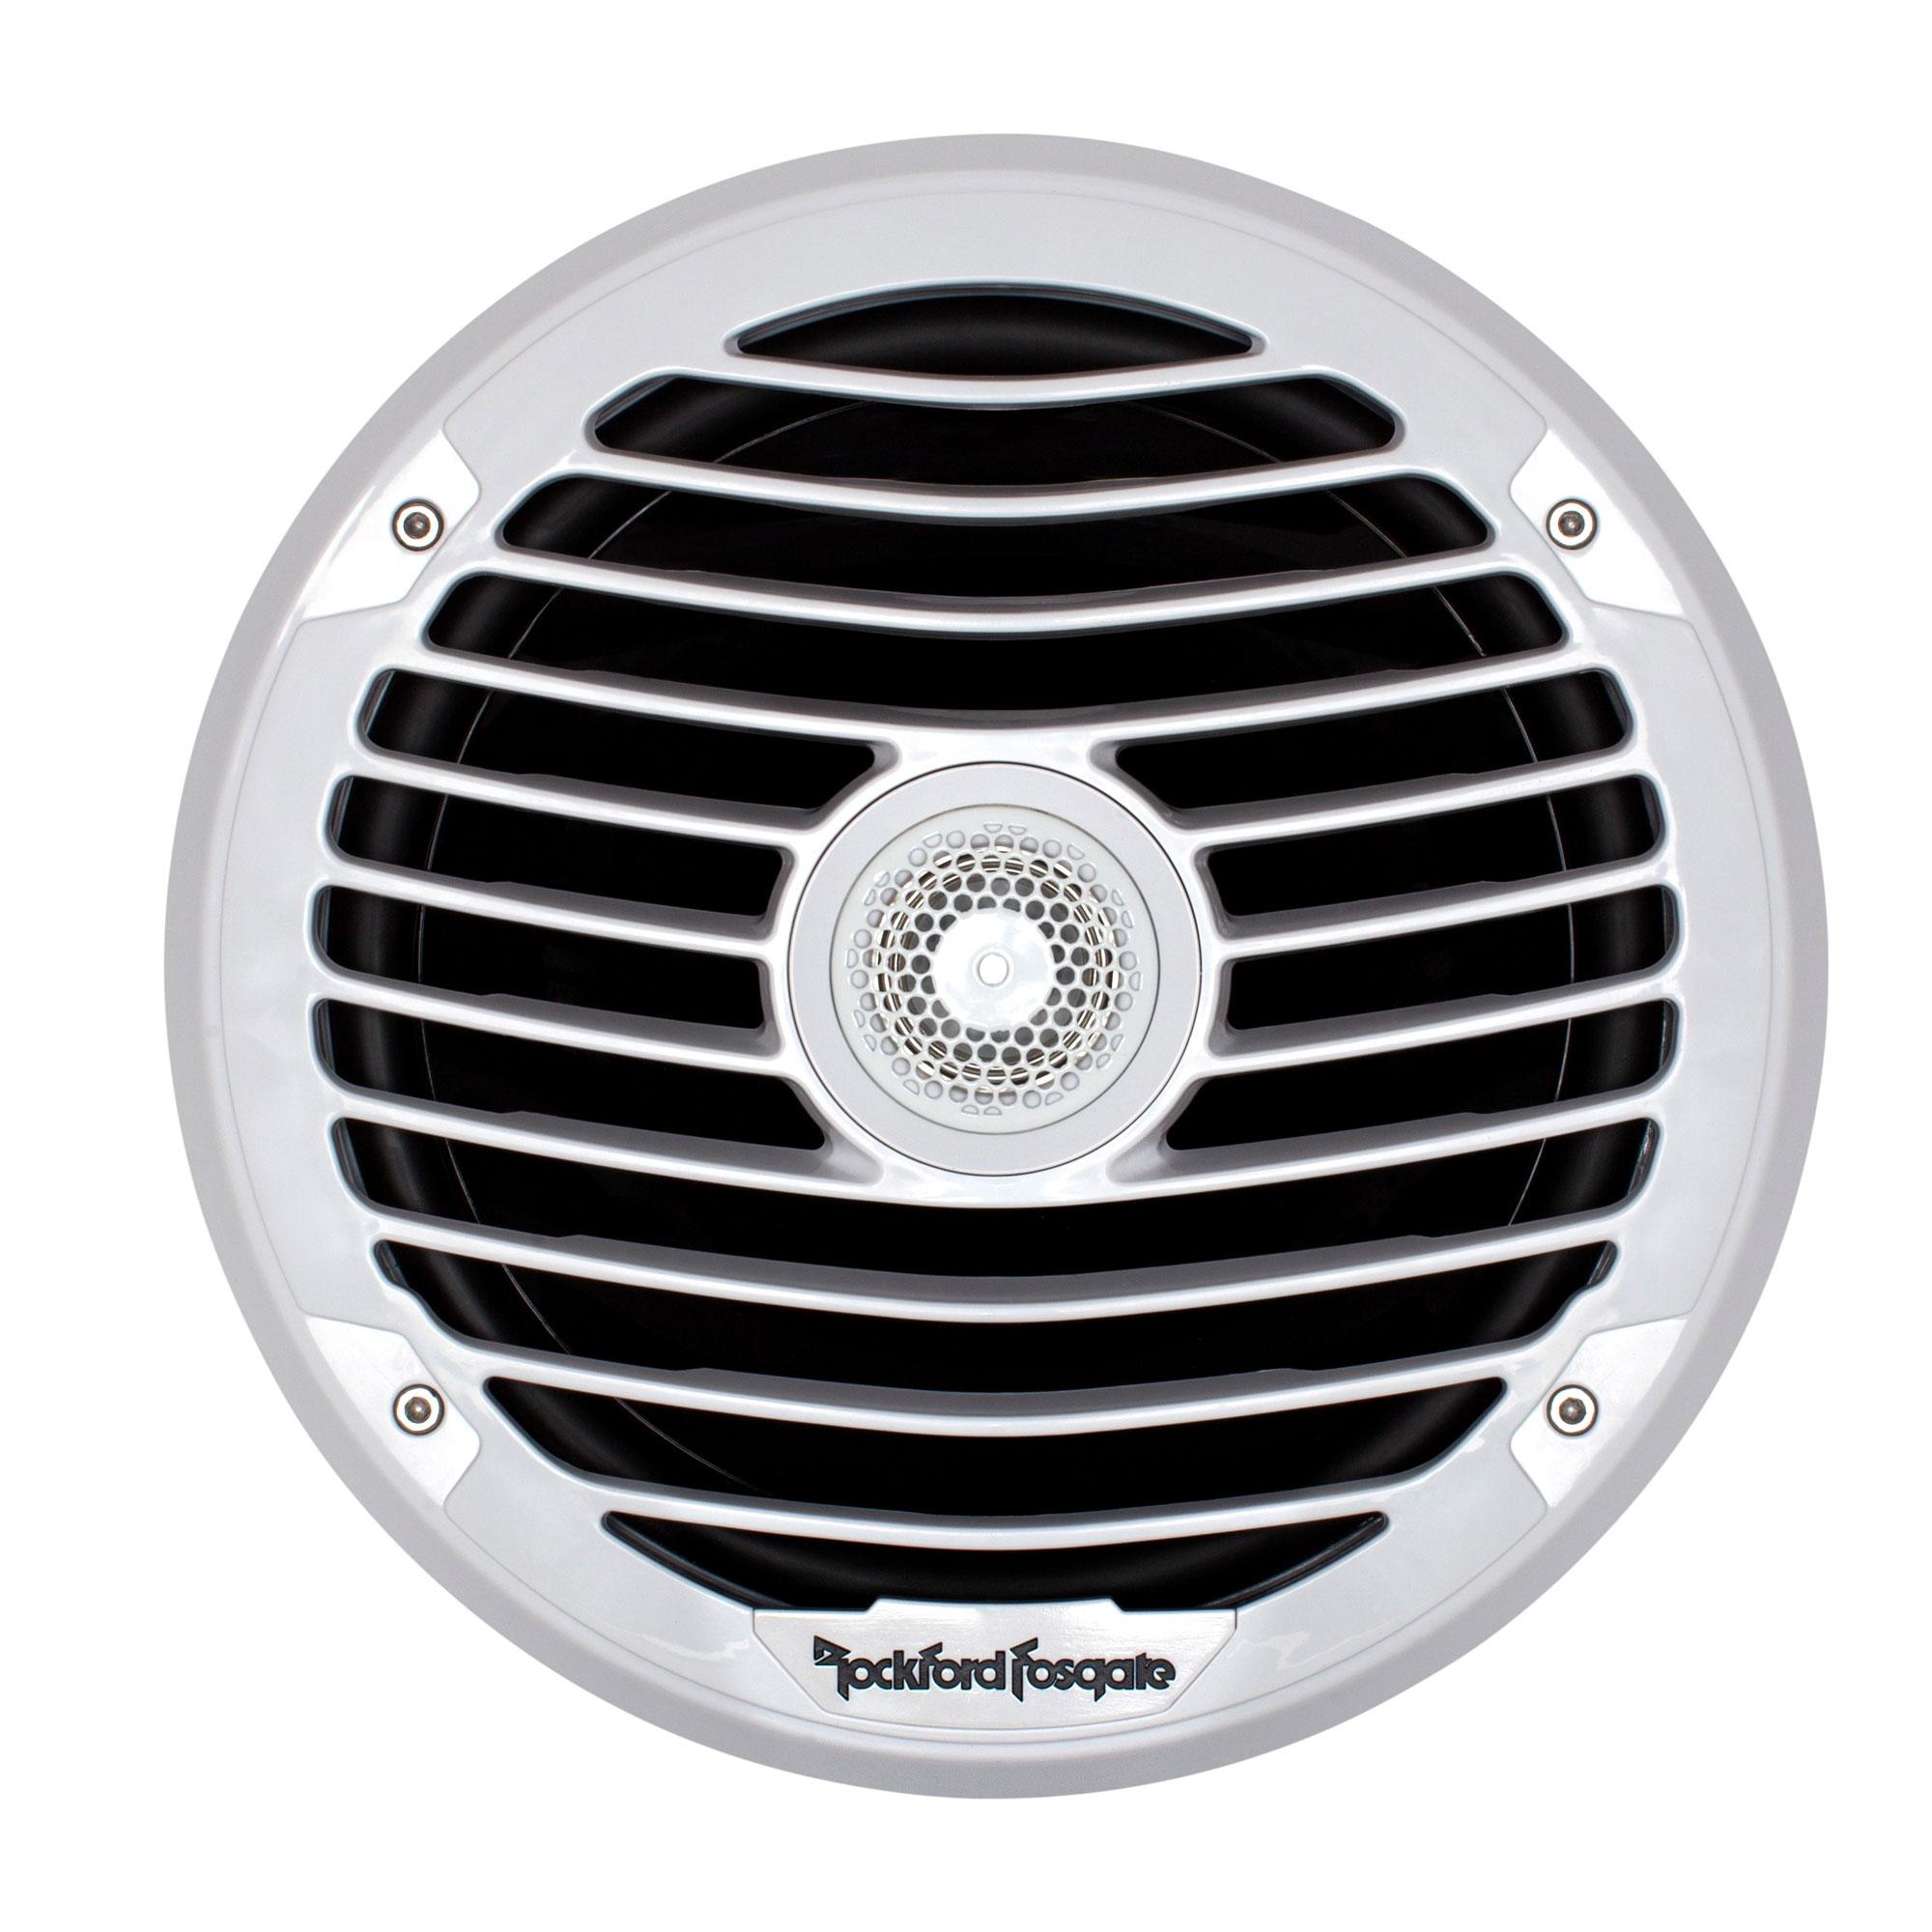 Rockford Fosgate Punch Marine Pm282x 8 Inch 200w 2 Way Boat Coaxial Hd Speakers